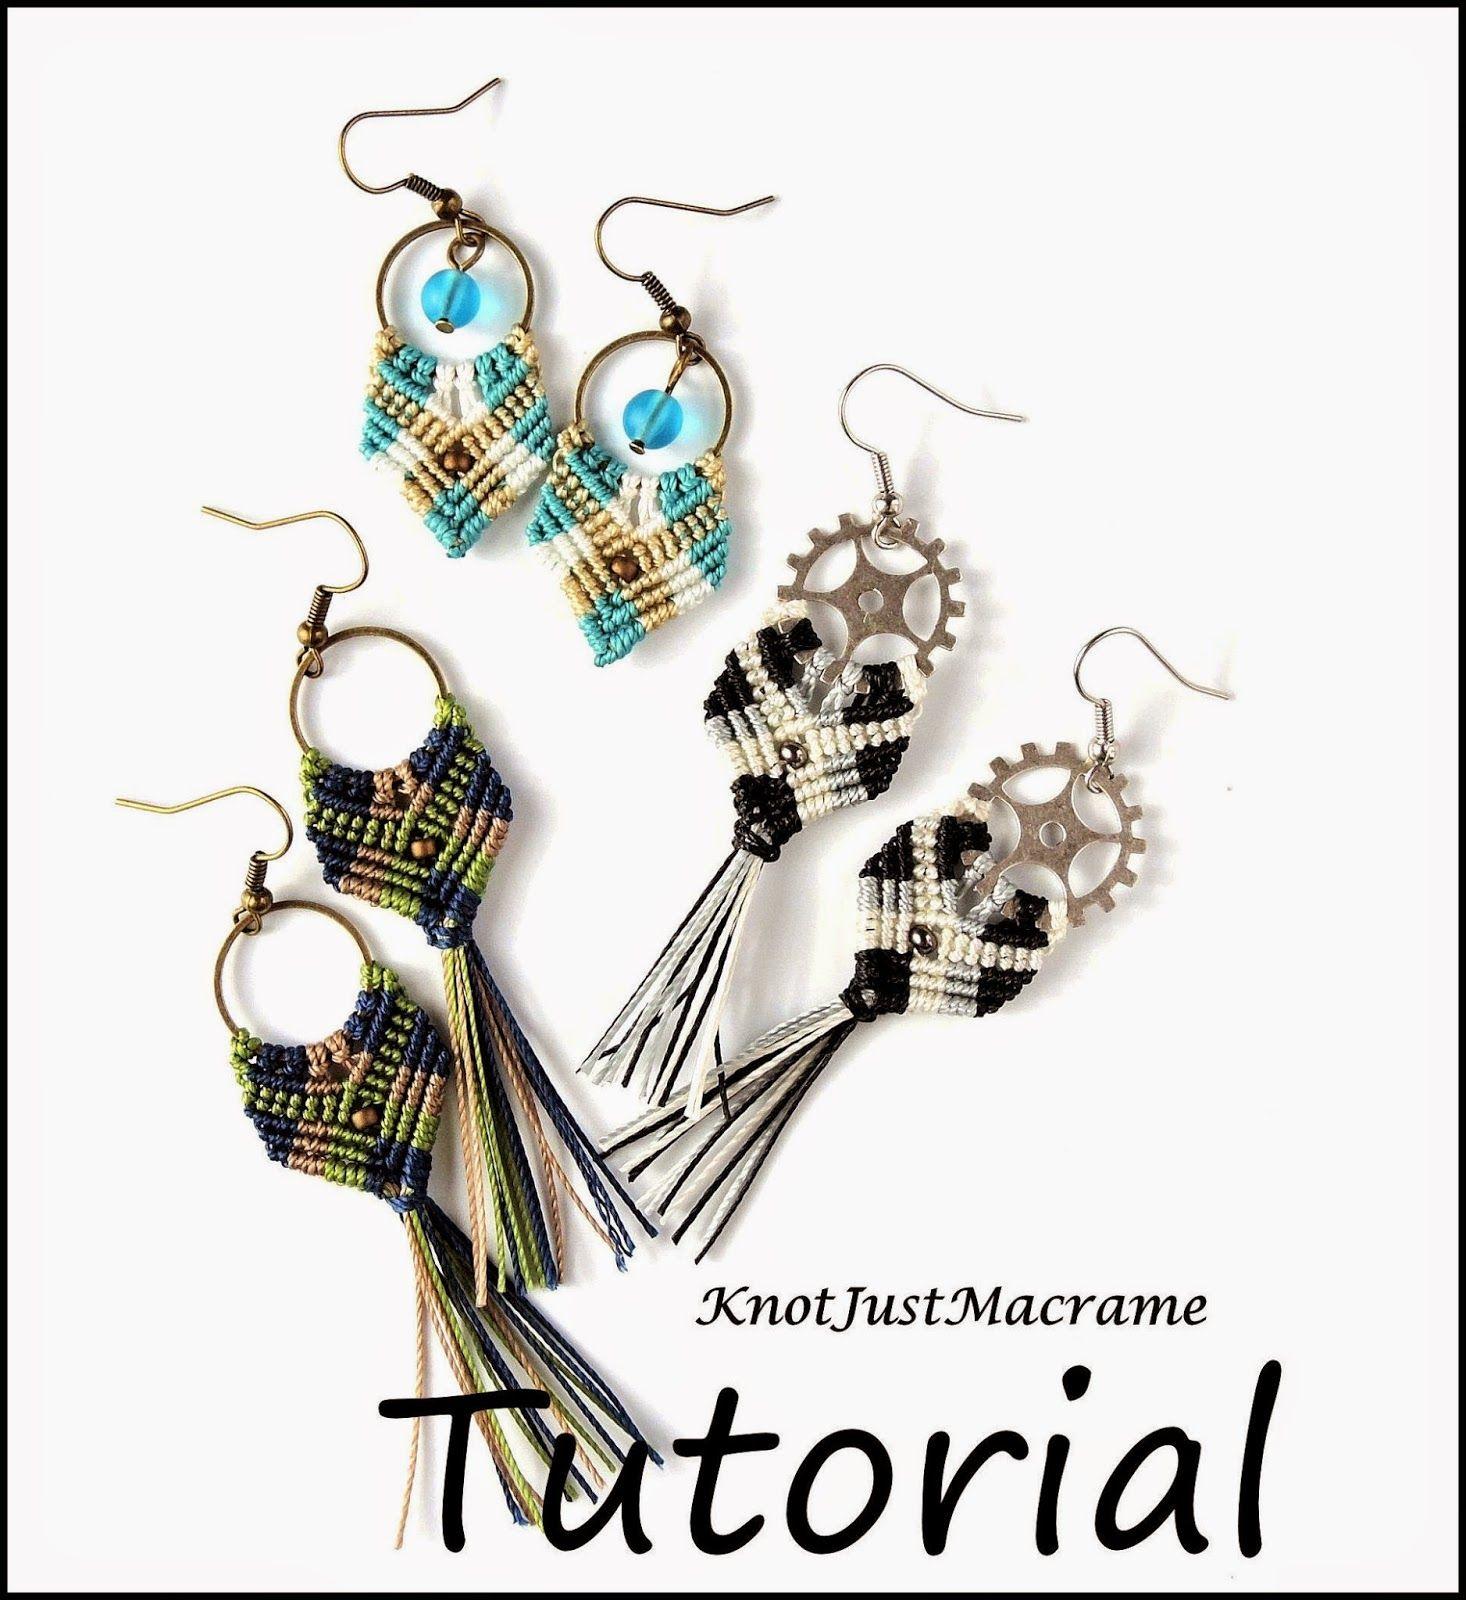 Gypsy Earrings Micro Macrame tutorial by Knot Just Macrame.